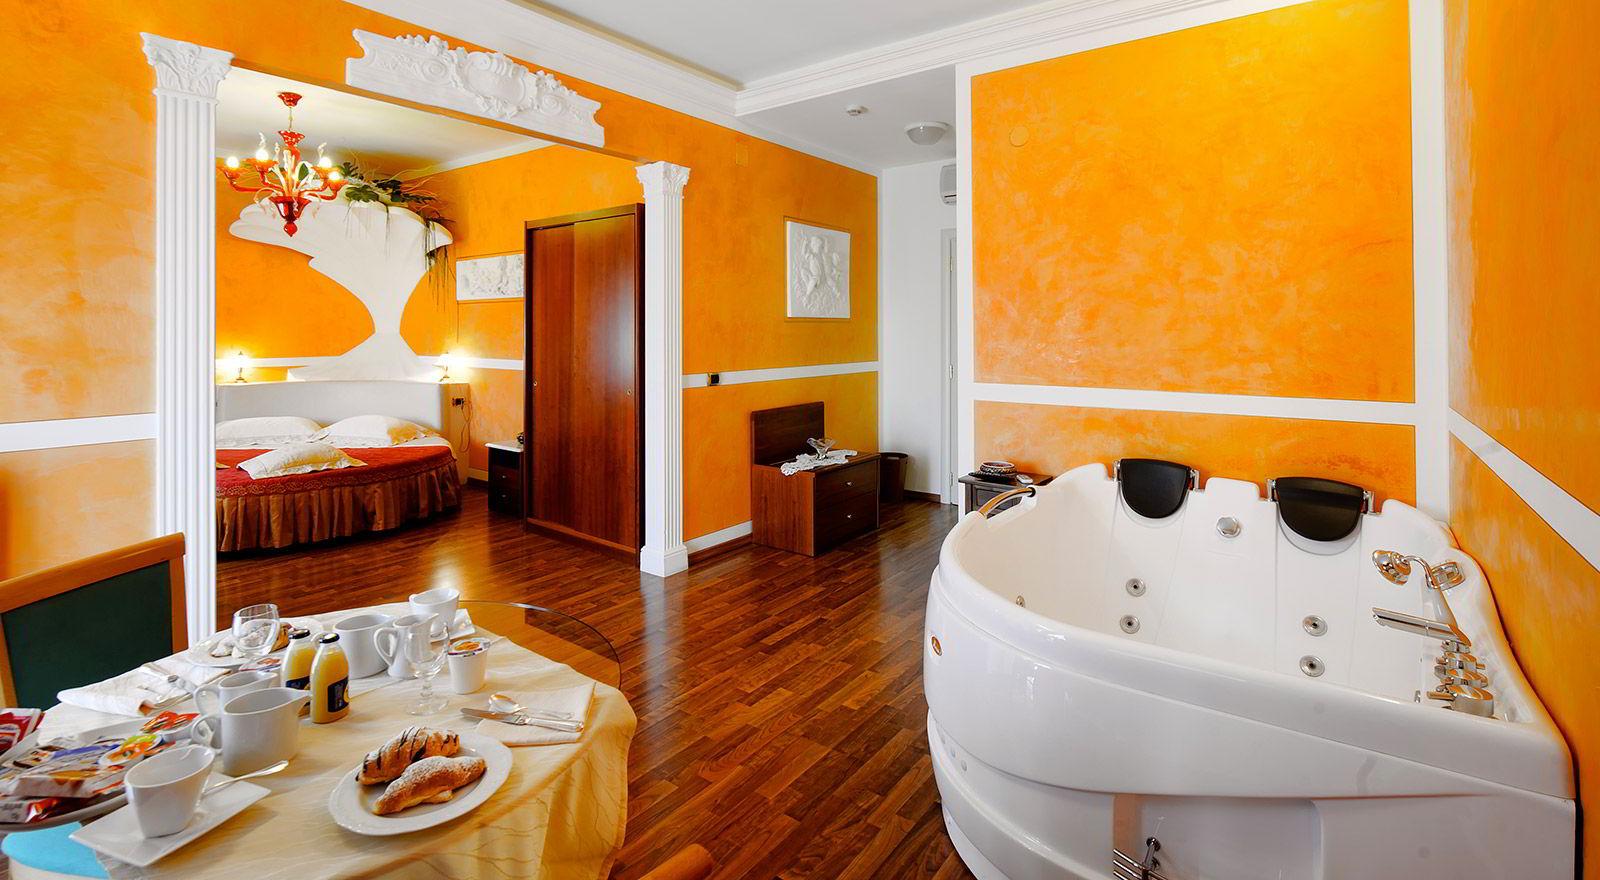 Camera Con Vasca Idromassaggio Per Due : Suite con vasca idromassaggio in umbria camere con vasca